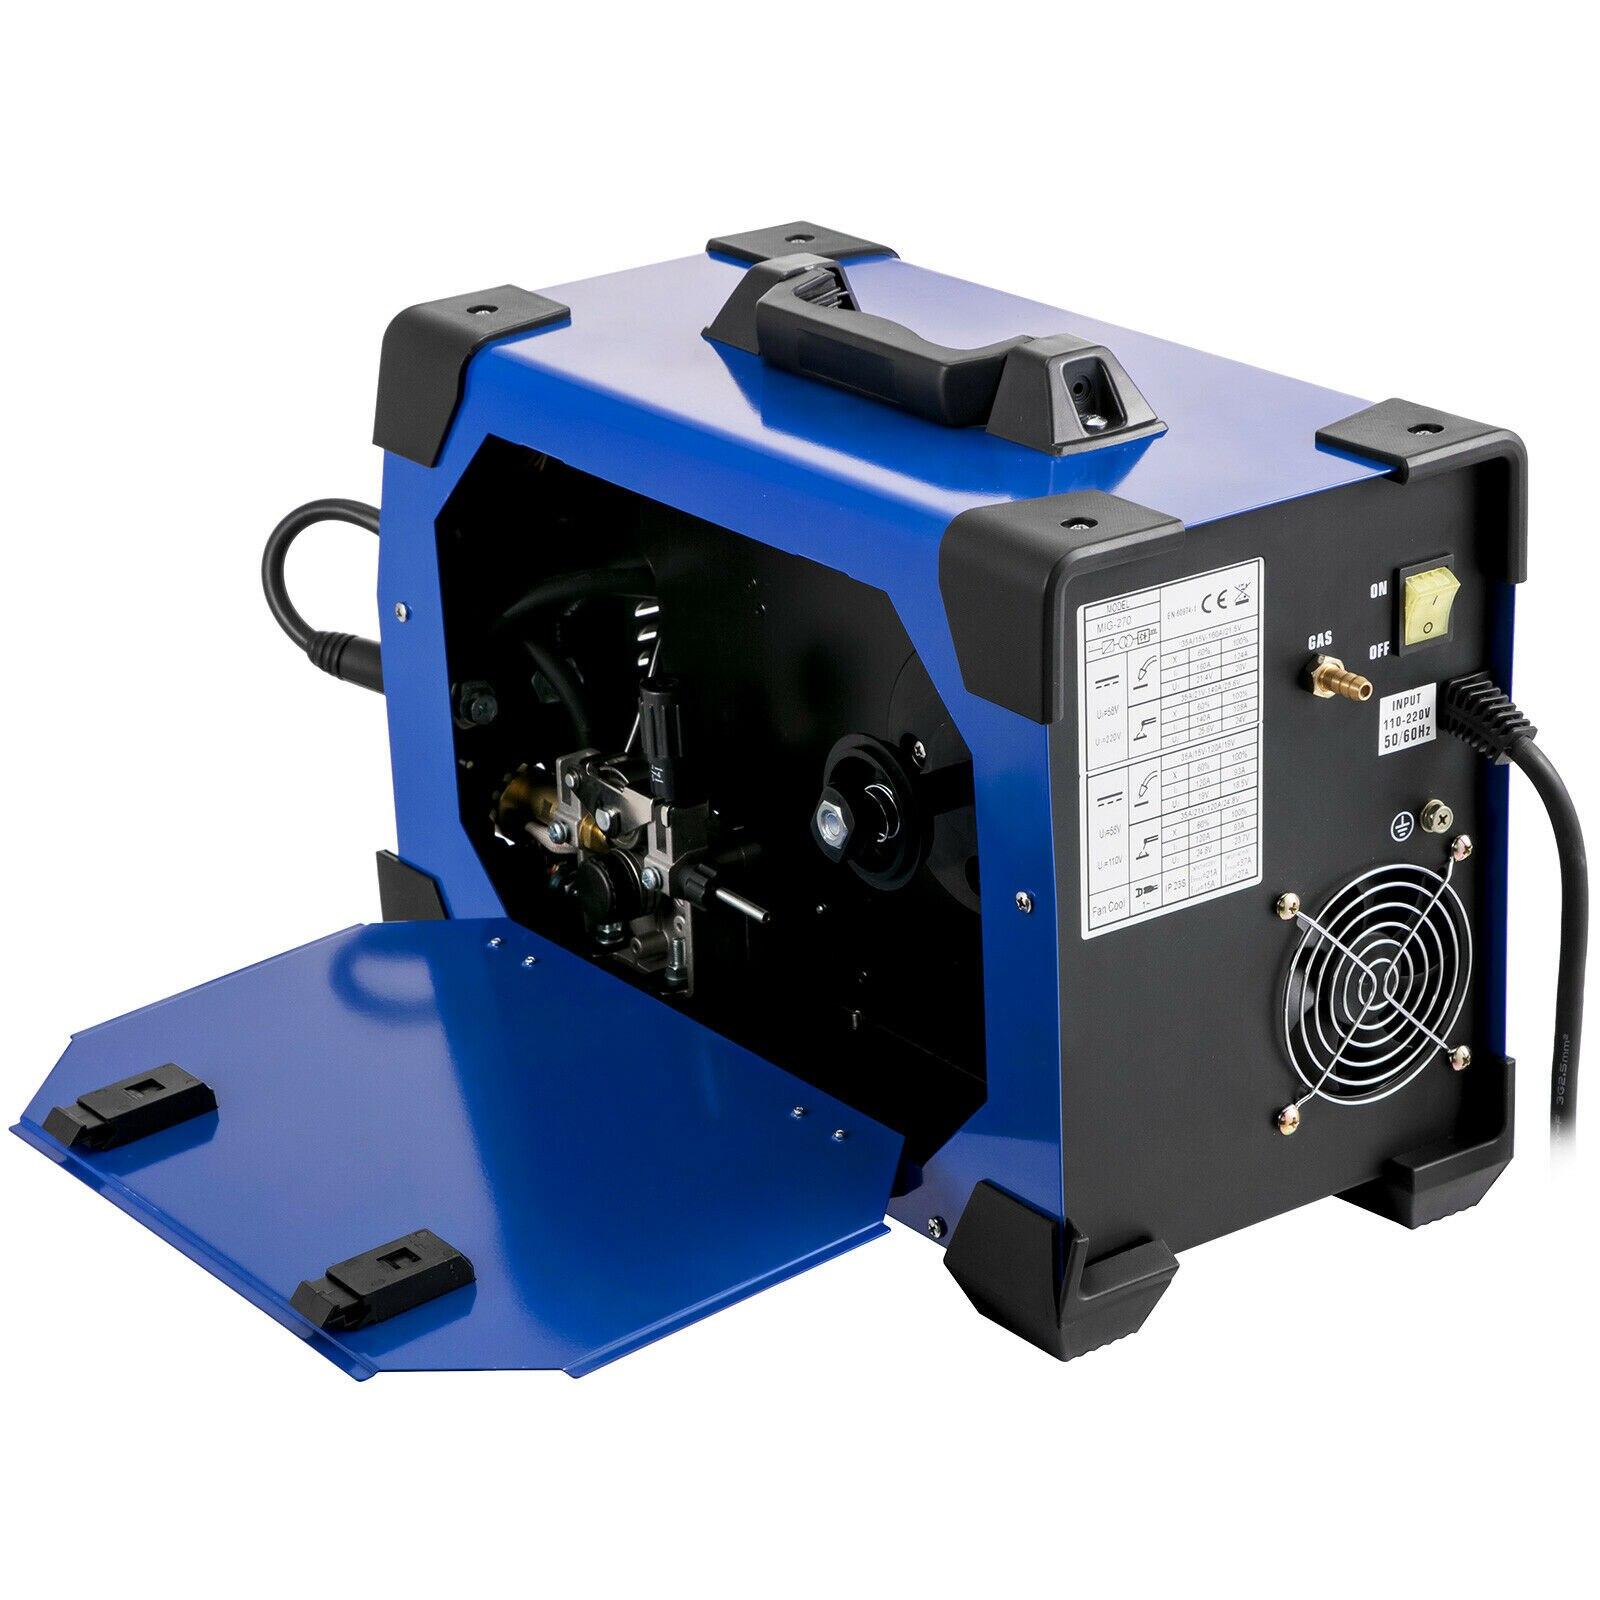 MIG EU Welding Machine Plug Welder MIG MMA 1 270A TIG 3 220V MMA Combo Mig Welder In